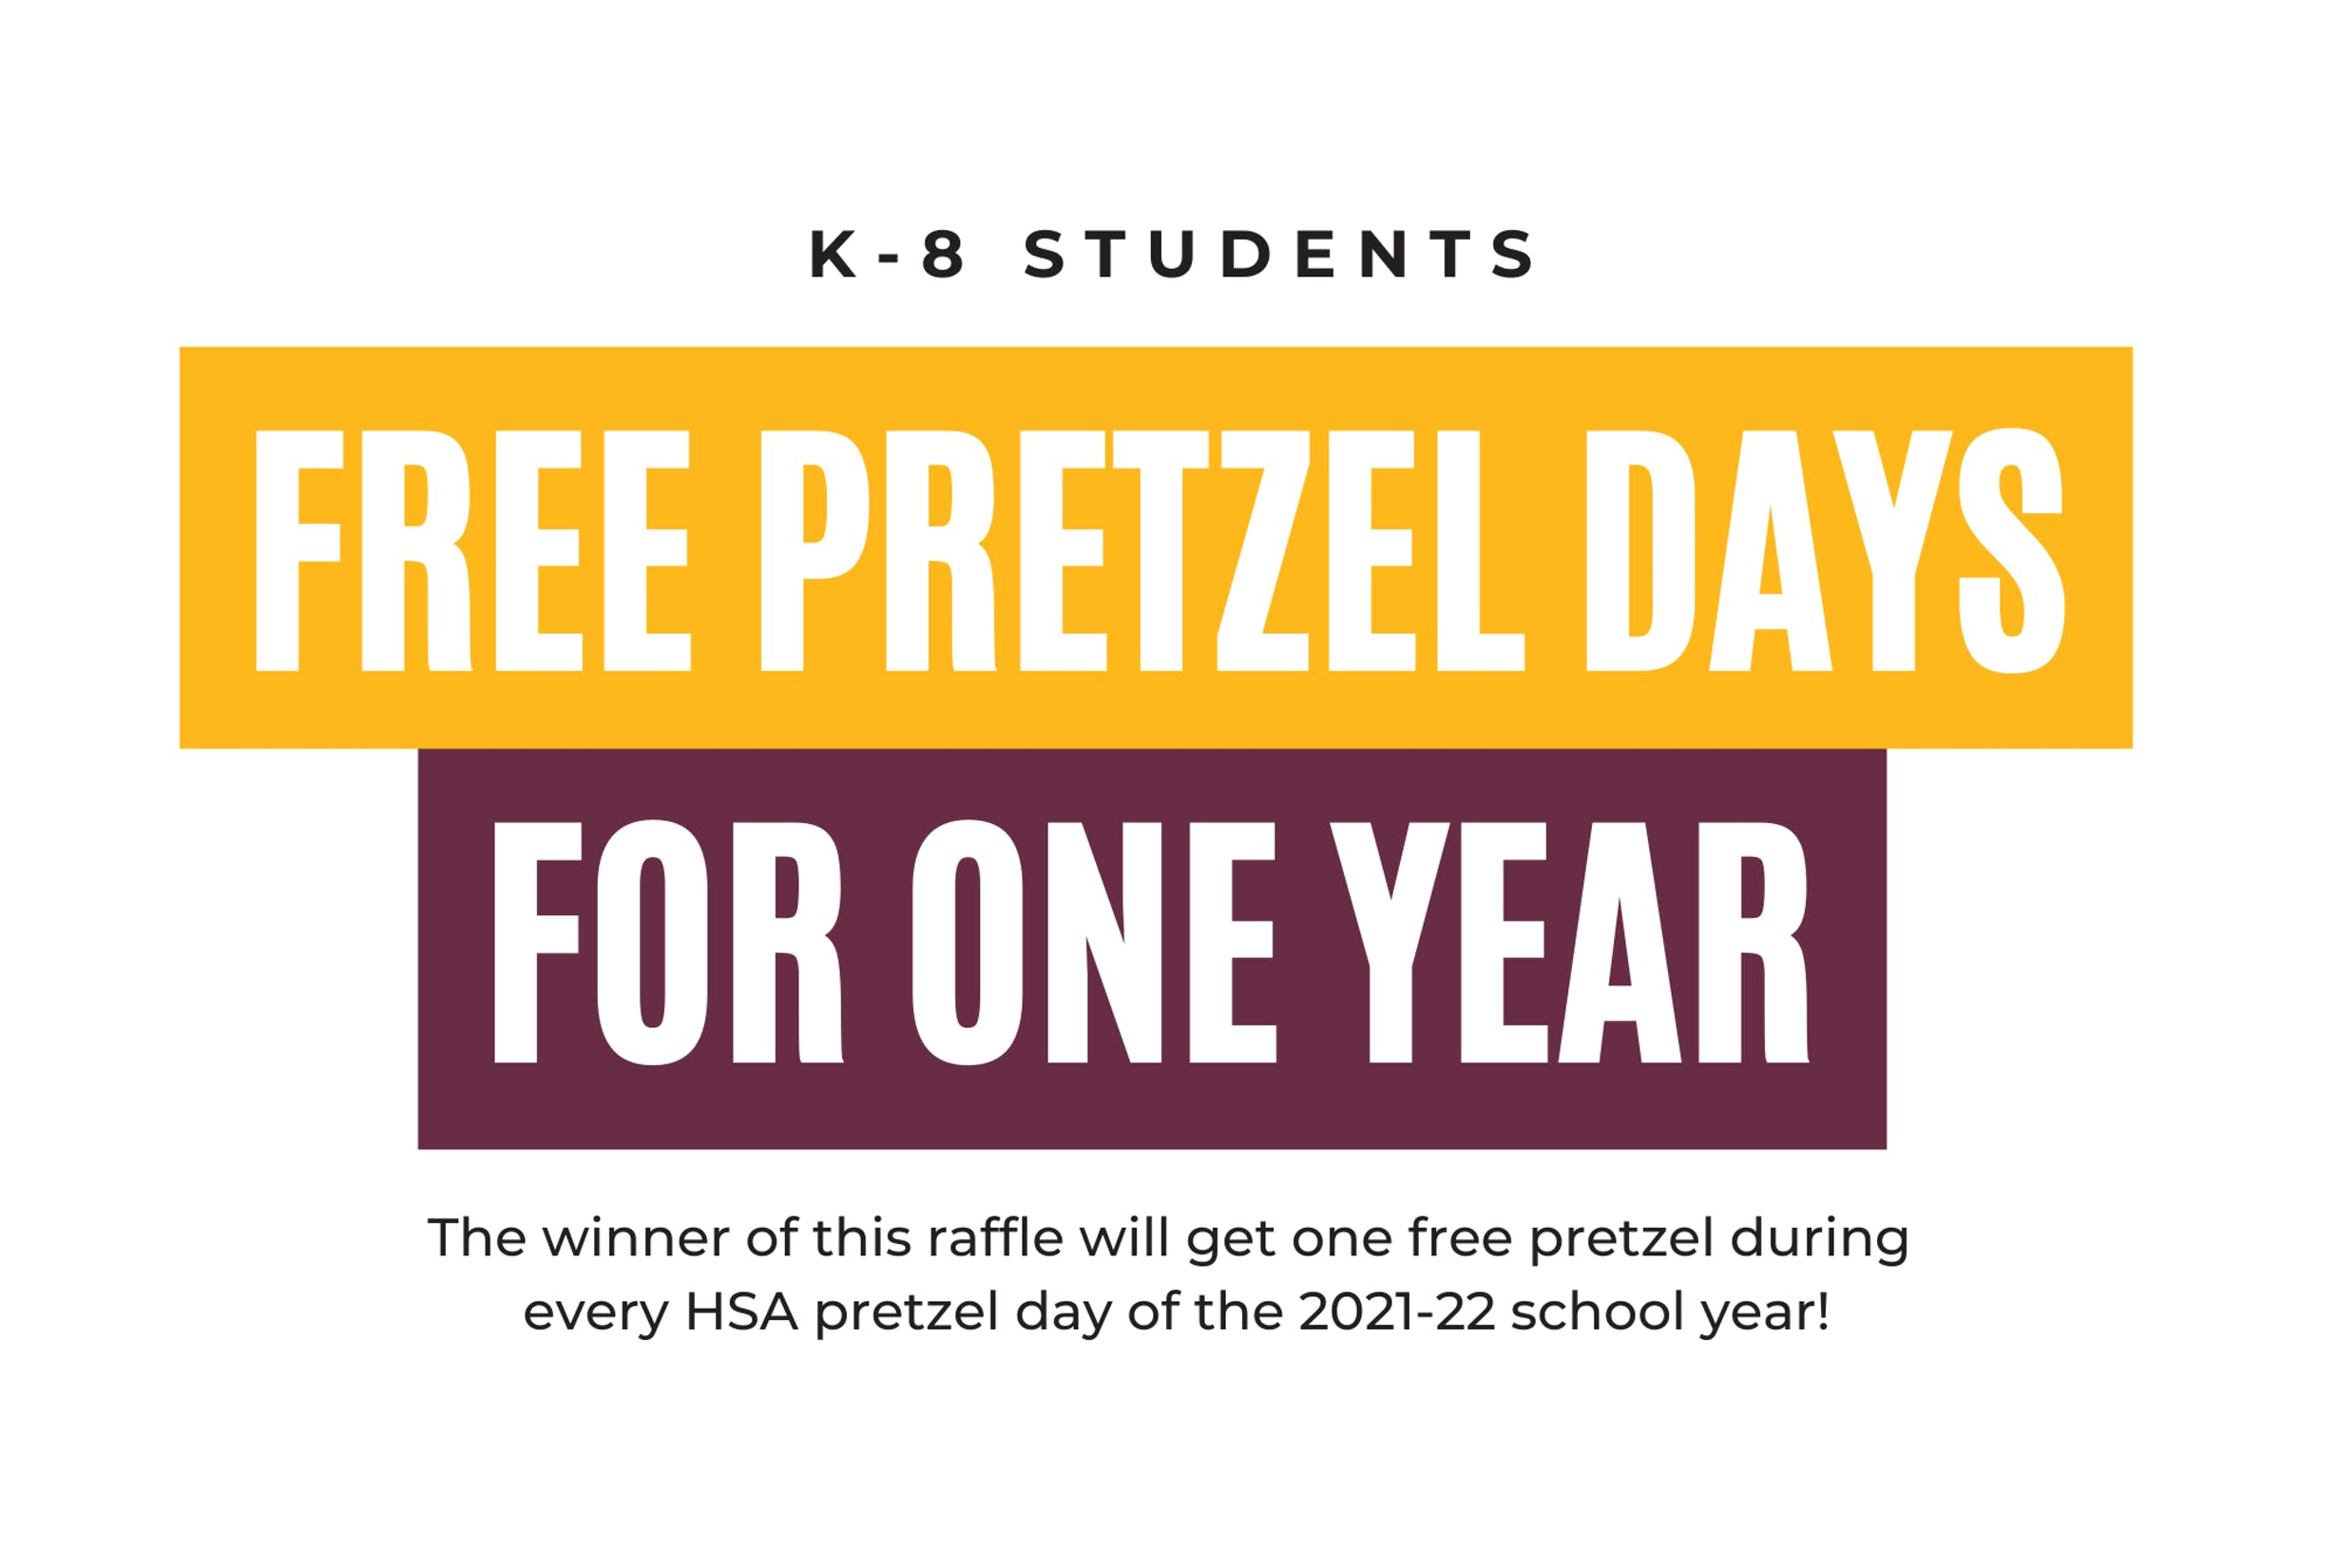 Free Pretzel Days for One Year Prize